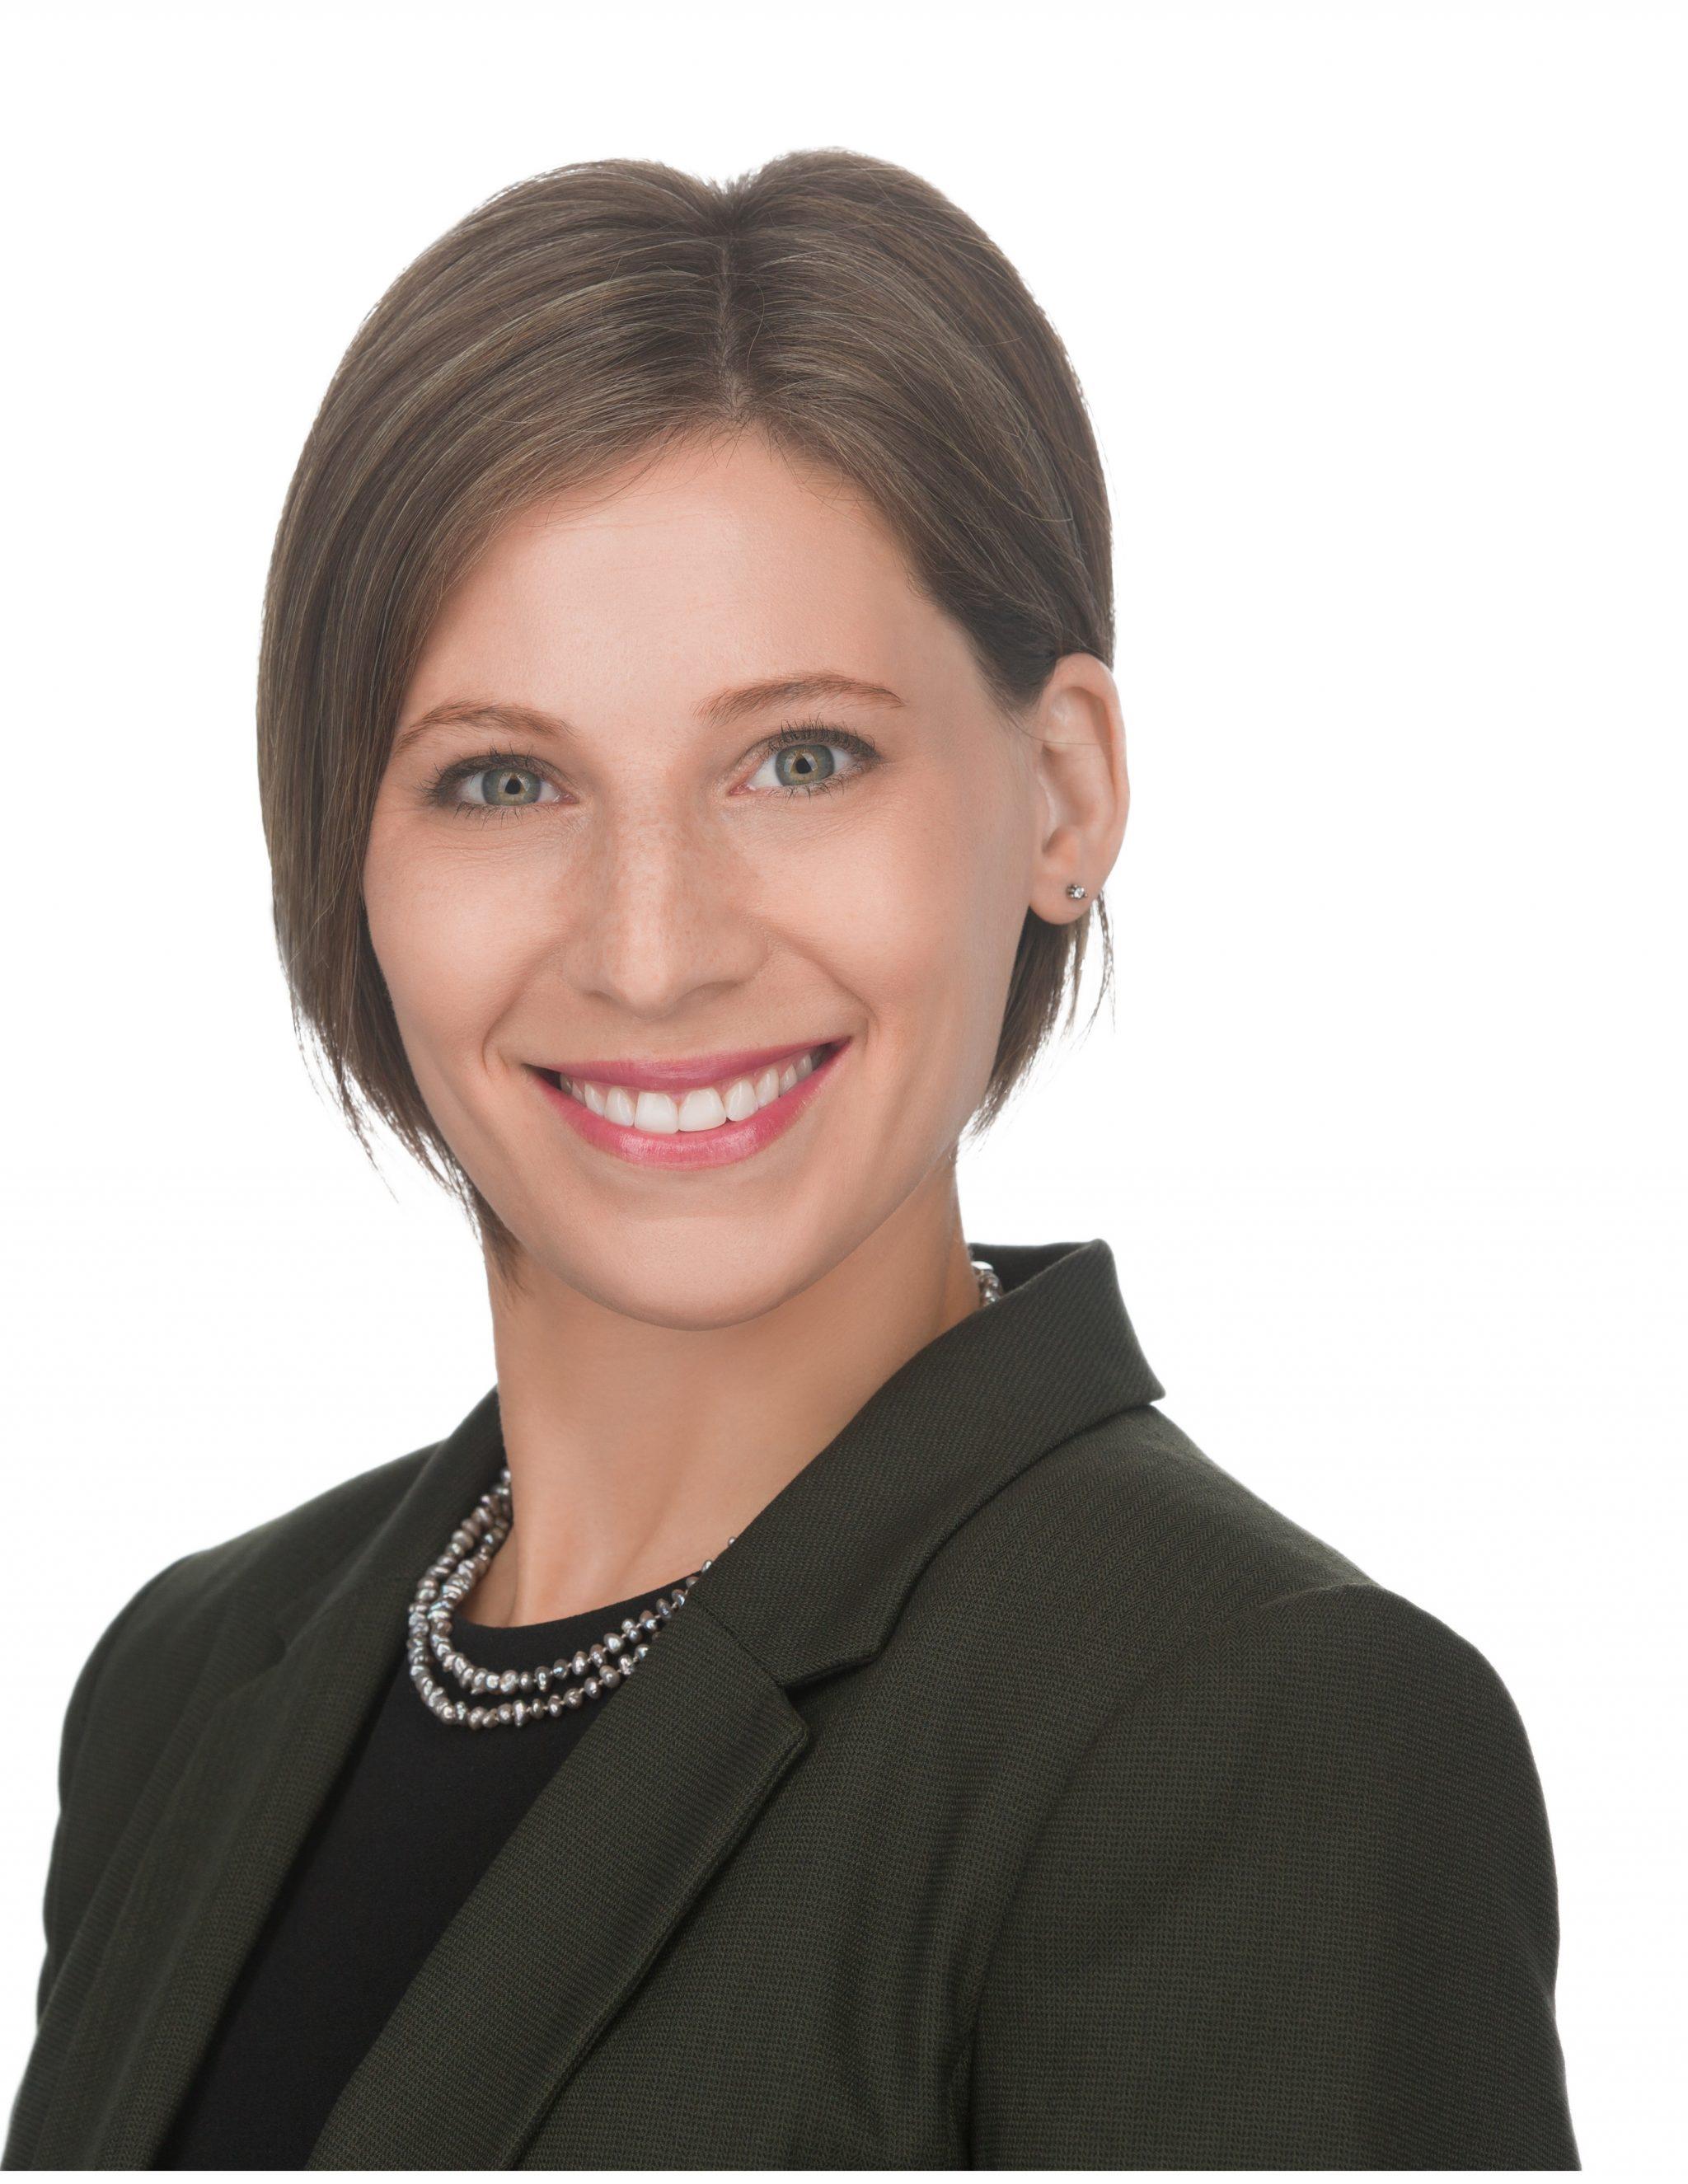 Jocelin Friedman, PT, DPT, RPSF-NDT